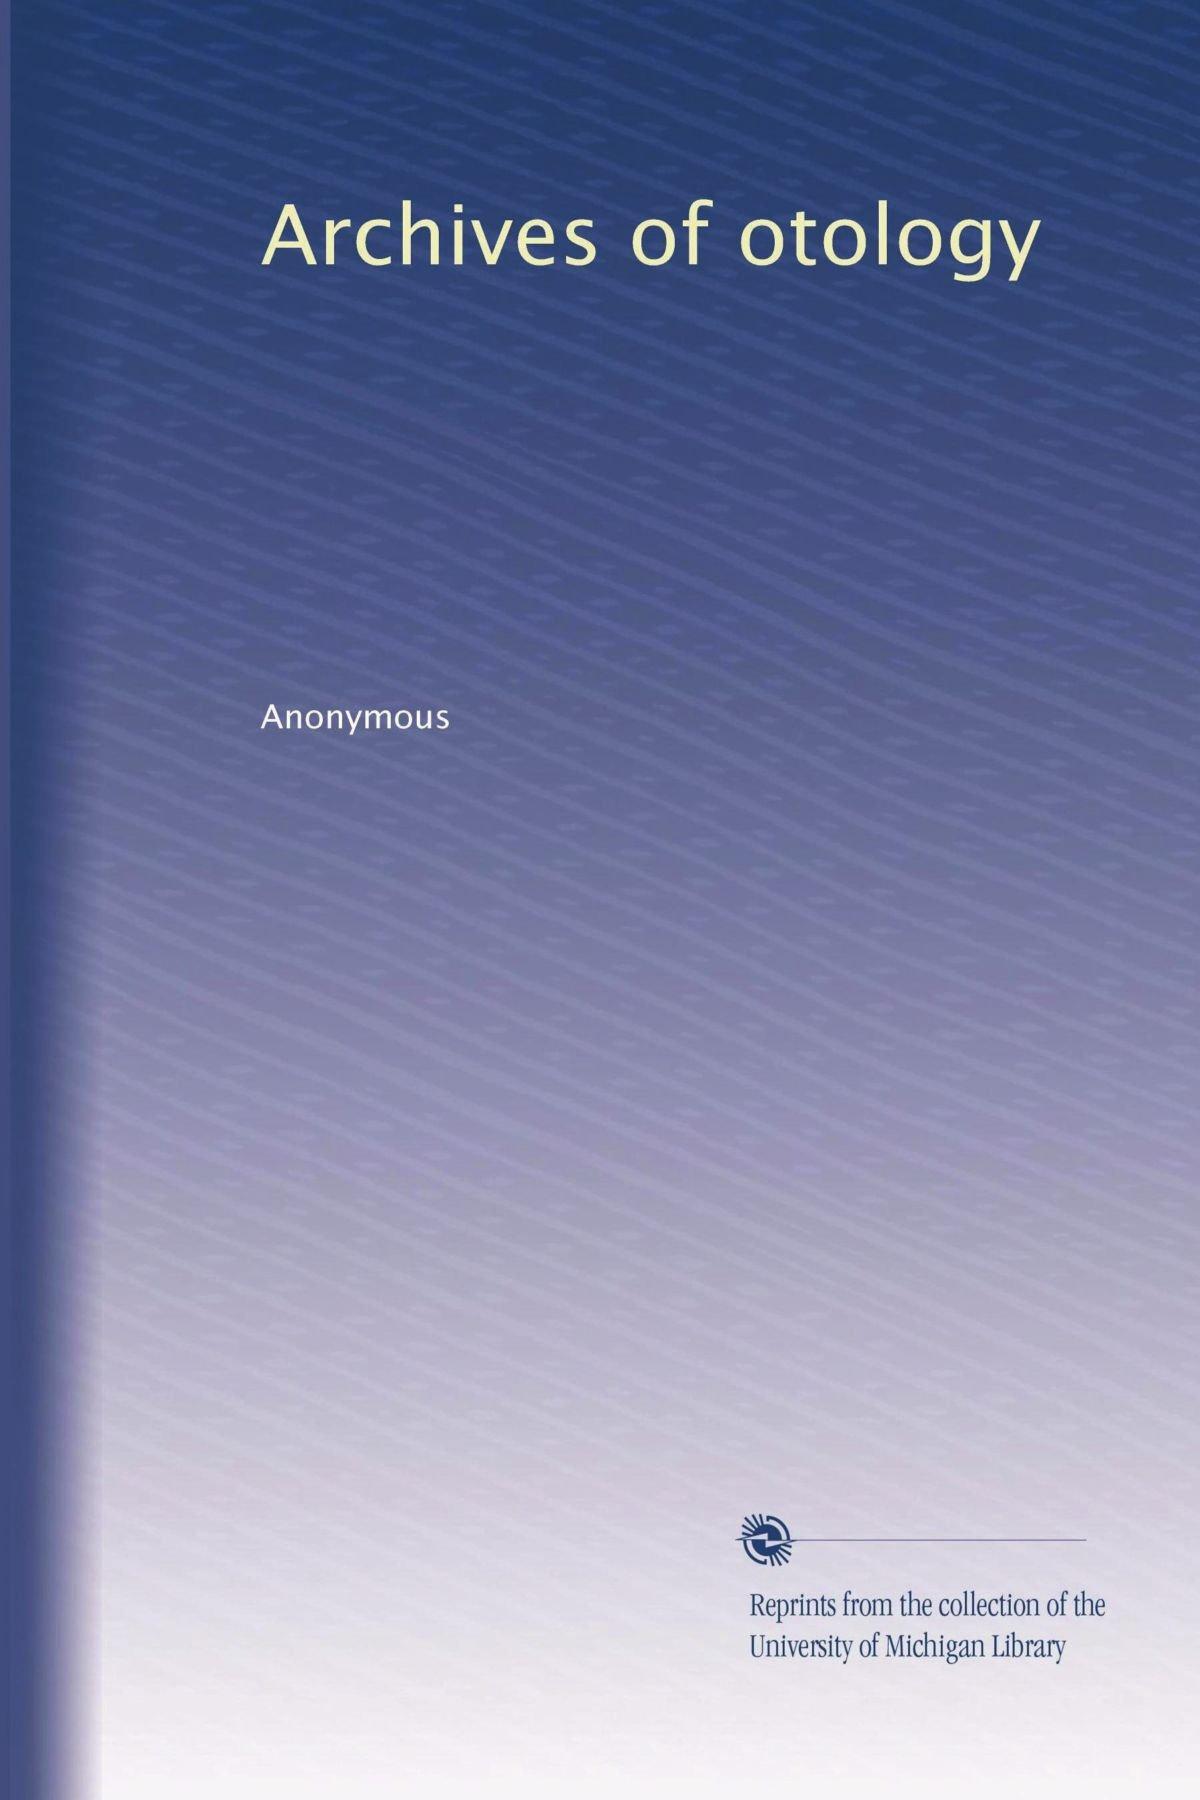 Archives of otology (Volume 8) pdf